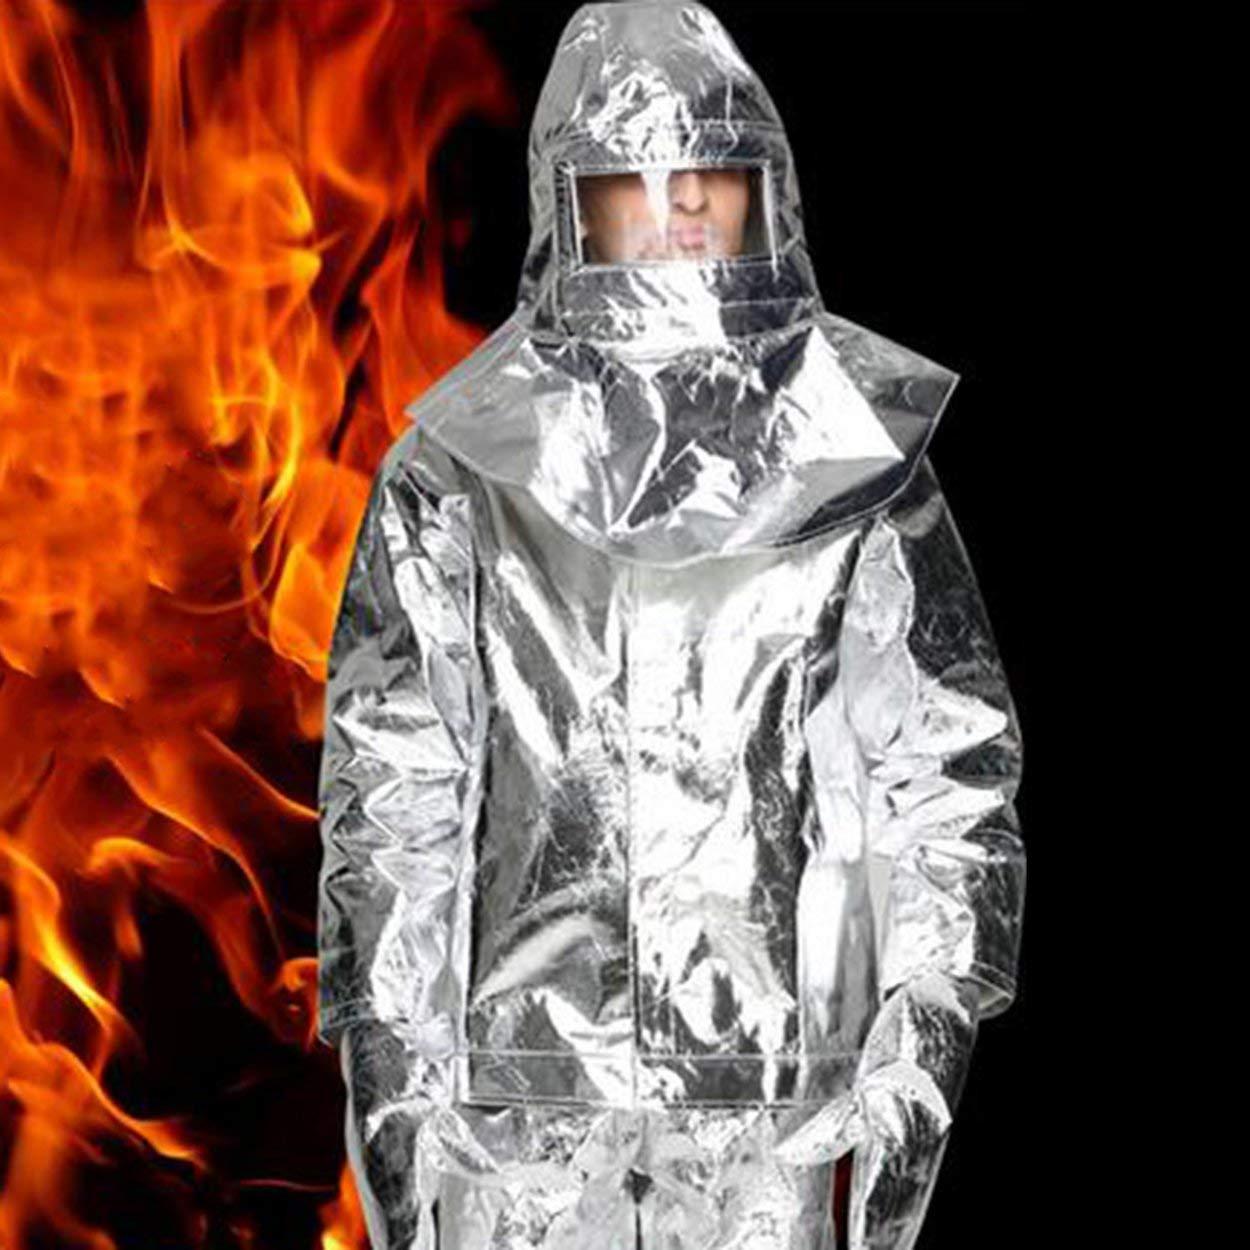 Lorenlli Aluminiumfolie feuergeschützte Kleidung Wärmedämmung Kleidung feuerfeste Aluminiumfolie Wärmedämmung Kleidung voller Satz